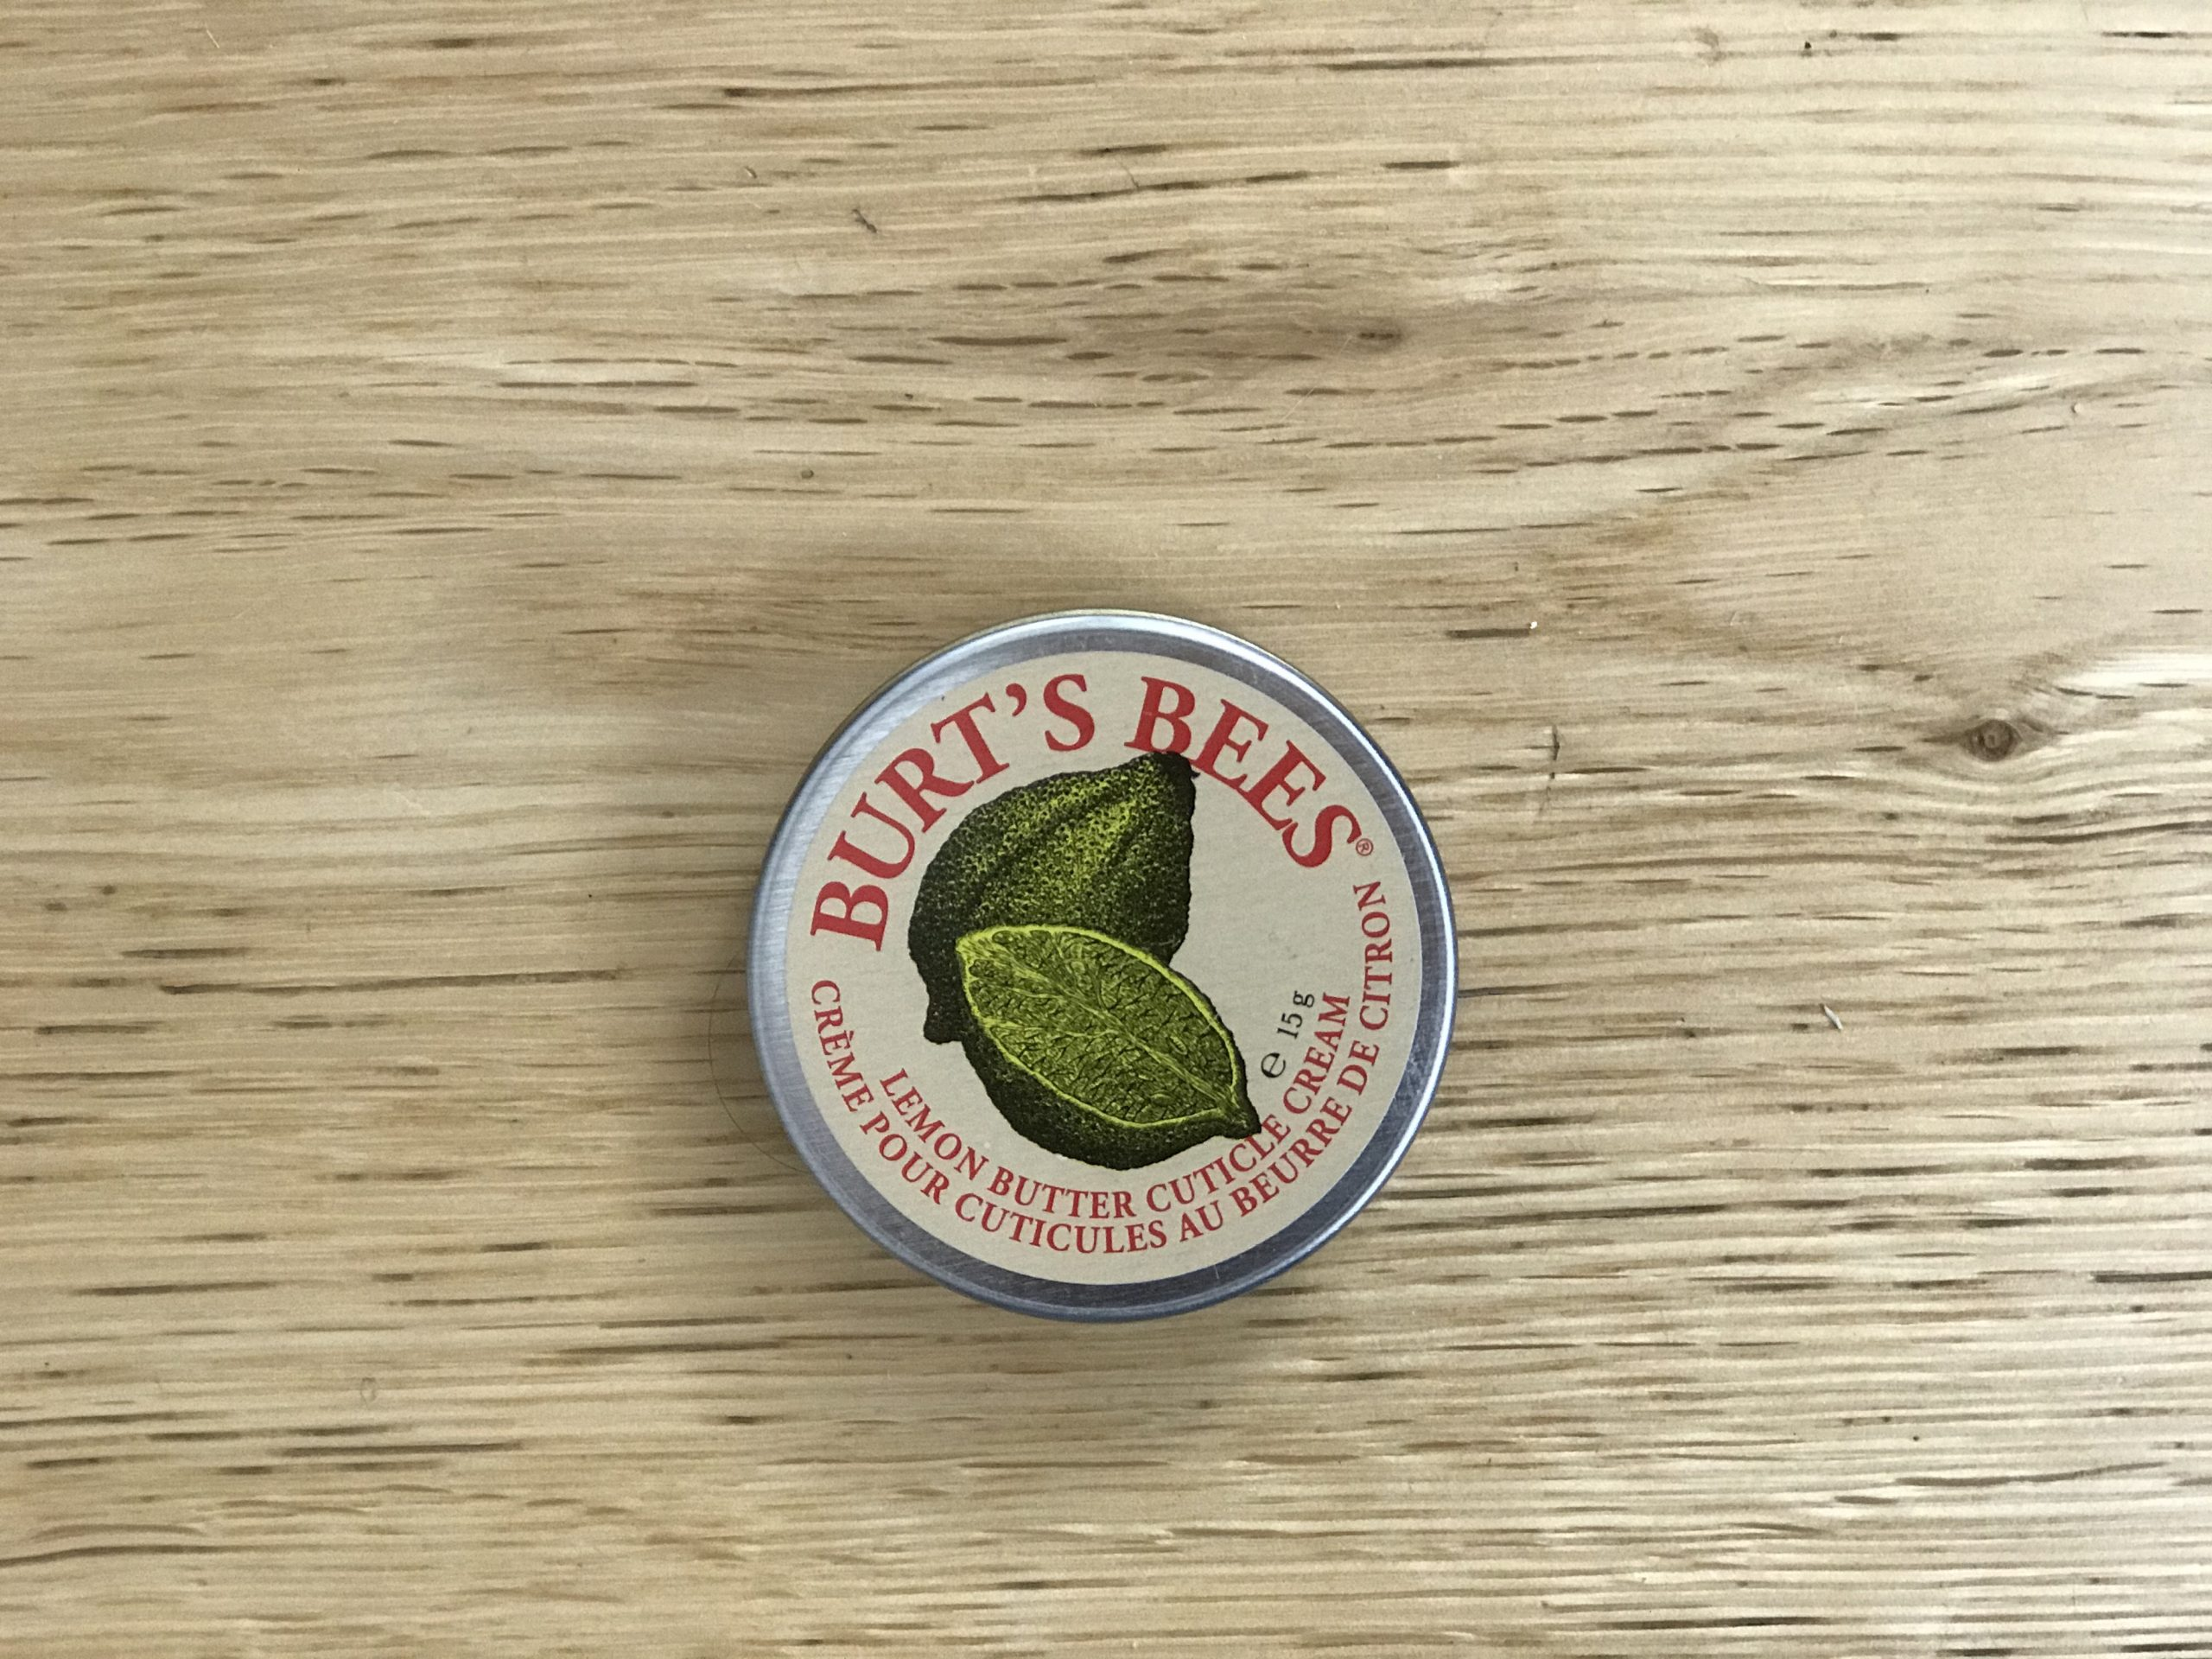 Burt's Bees Cuticle Cream - 1 of 8 Lockdown Must-Haves